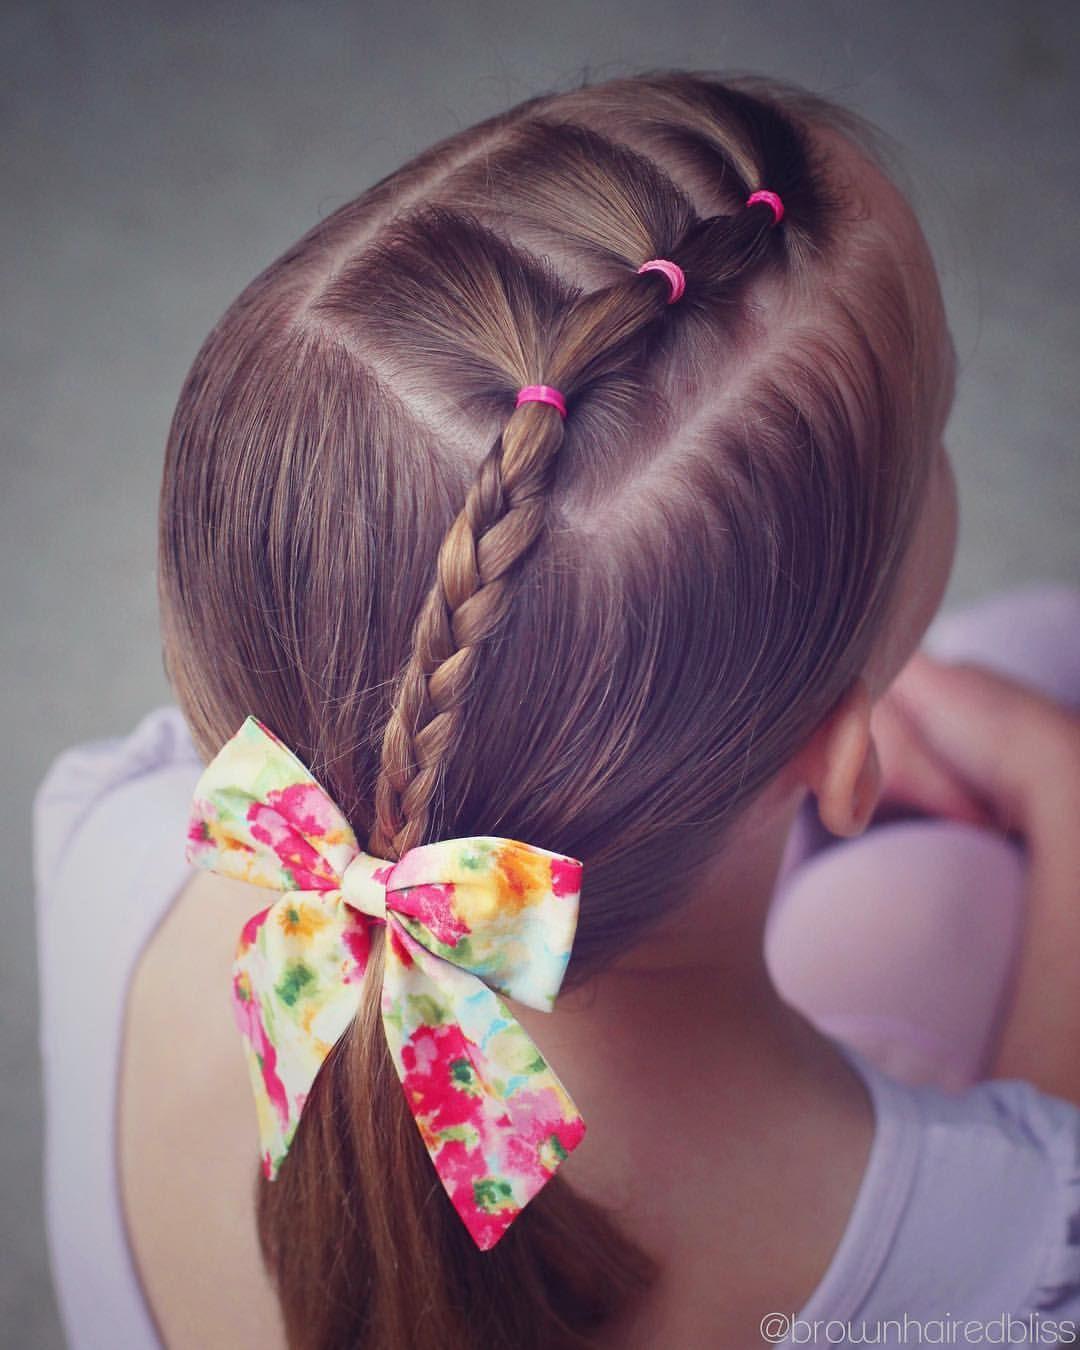 Pin by sazia choudhury on girls hair pinterest girl hair hair